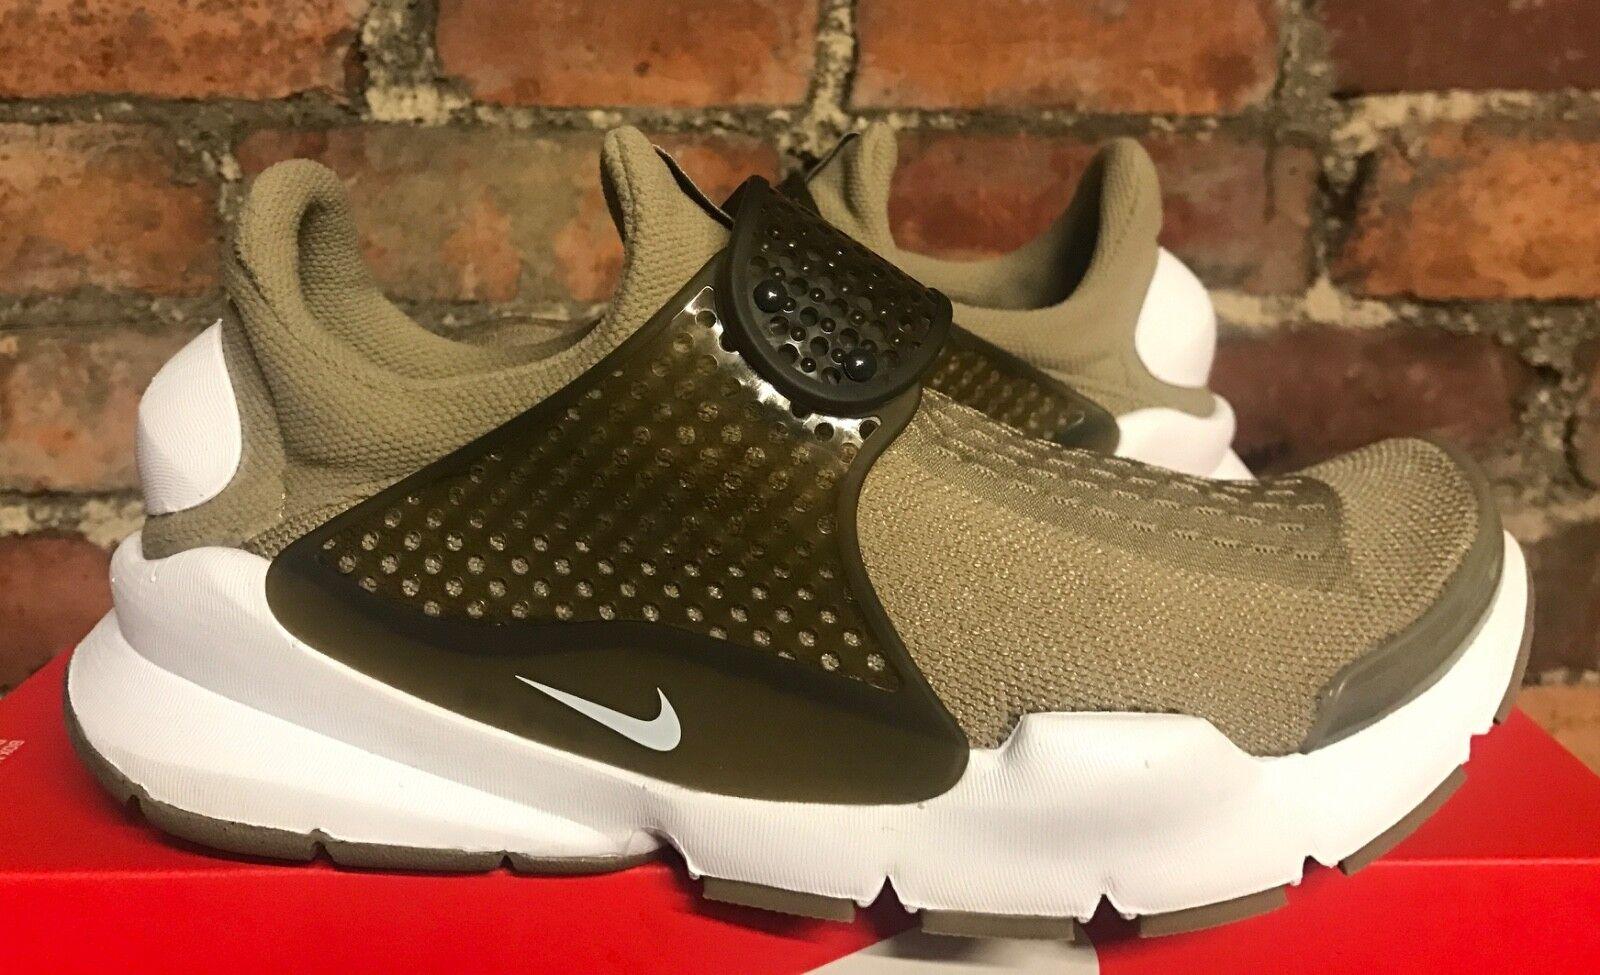 Nike Sock Dart Kjcrd UK7 EU41 EU41 EU41 US8 Khaki Bianco 819686 200 Scarpe Sportive fe982d